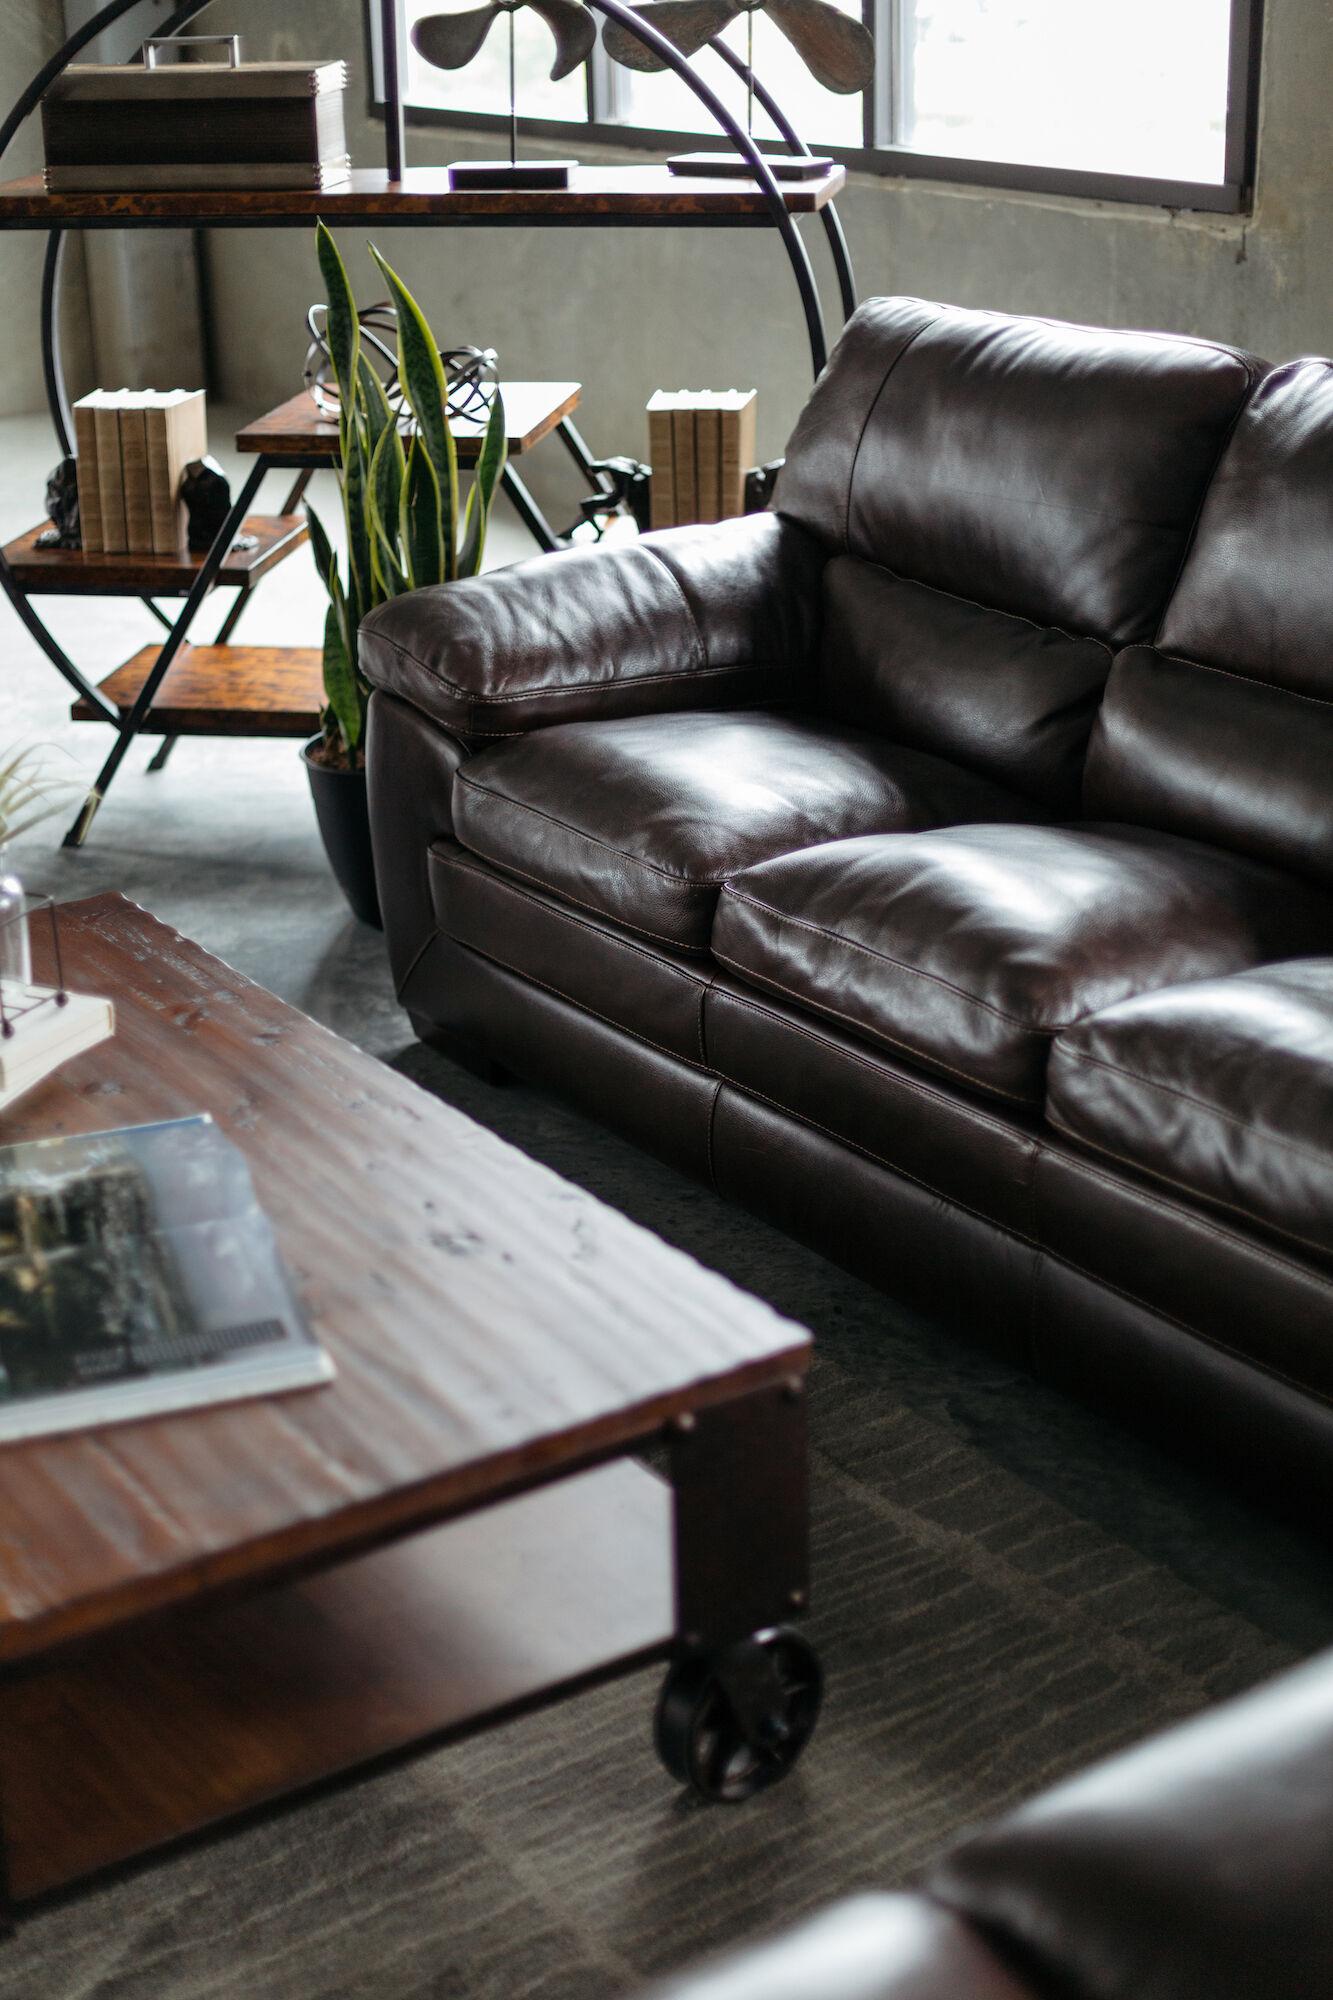 87u0026quot; Leather Sofa In Dark Brown